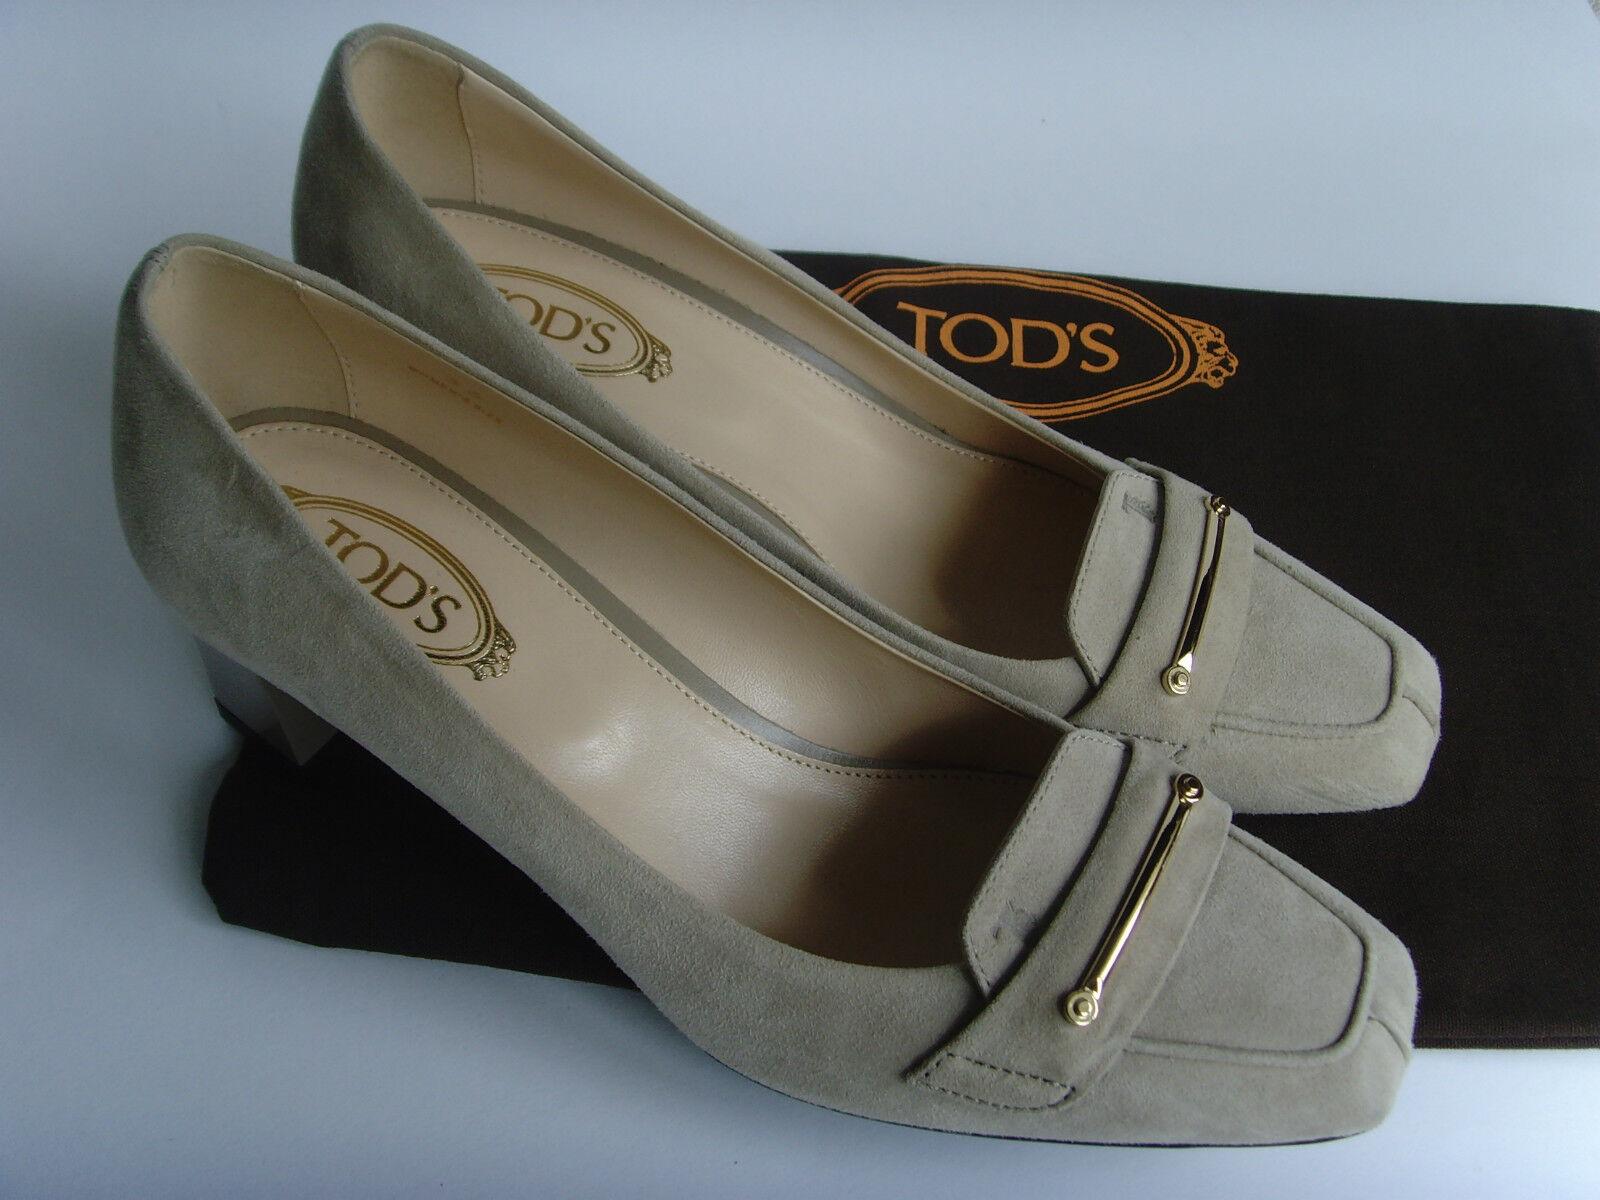 Leder Pumps - beige - Luxus Marke - Original TOD'S - Italy - Gr.36 - NEU!